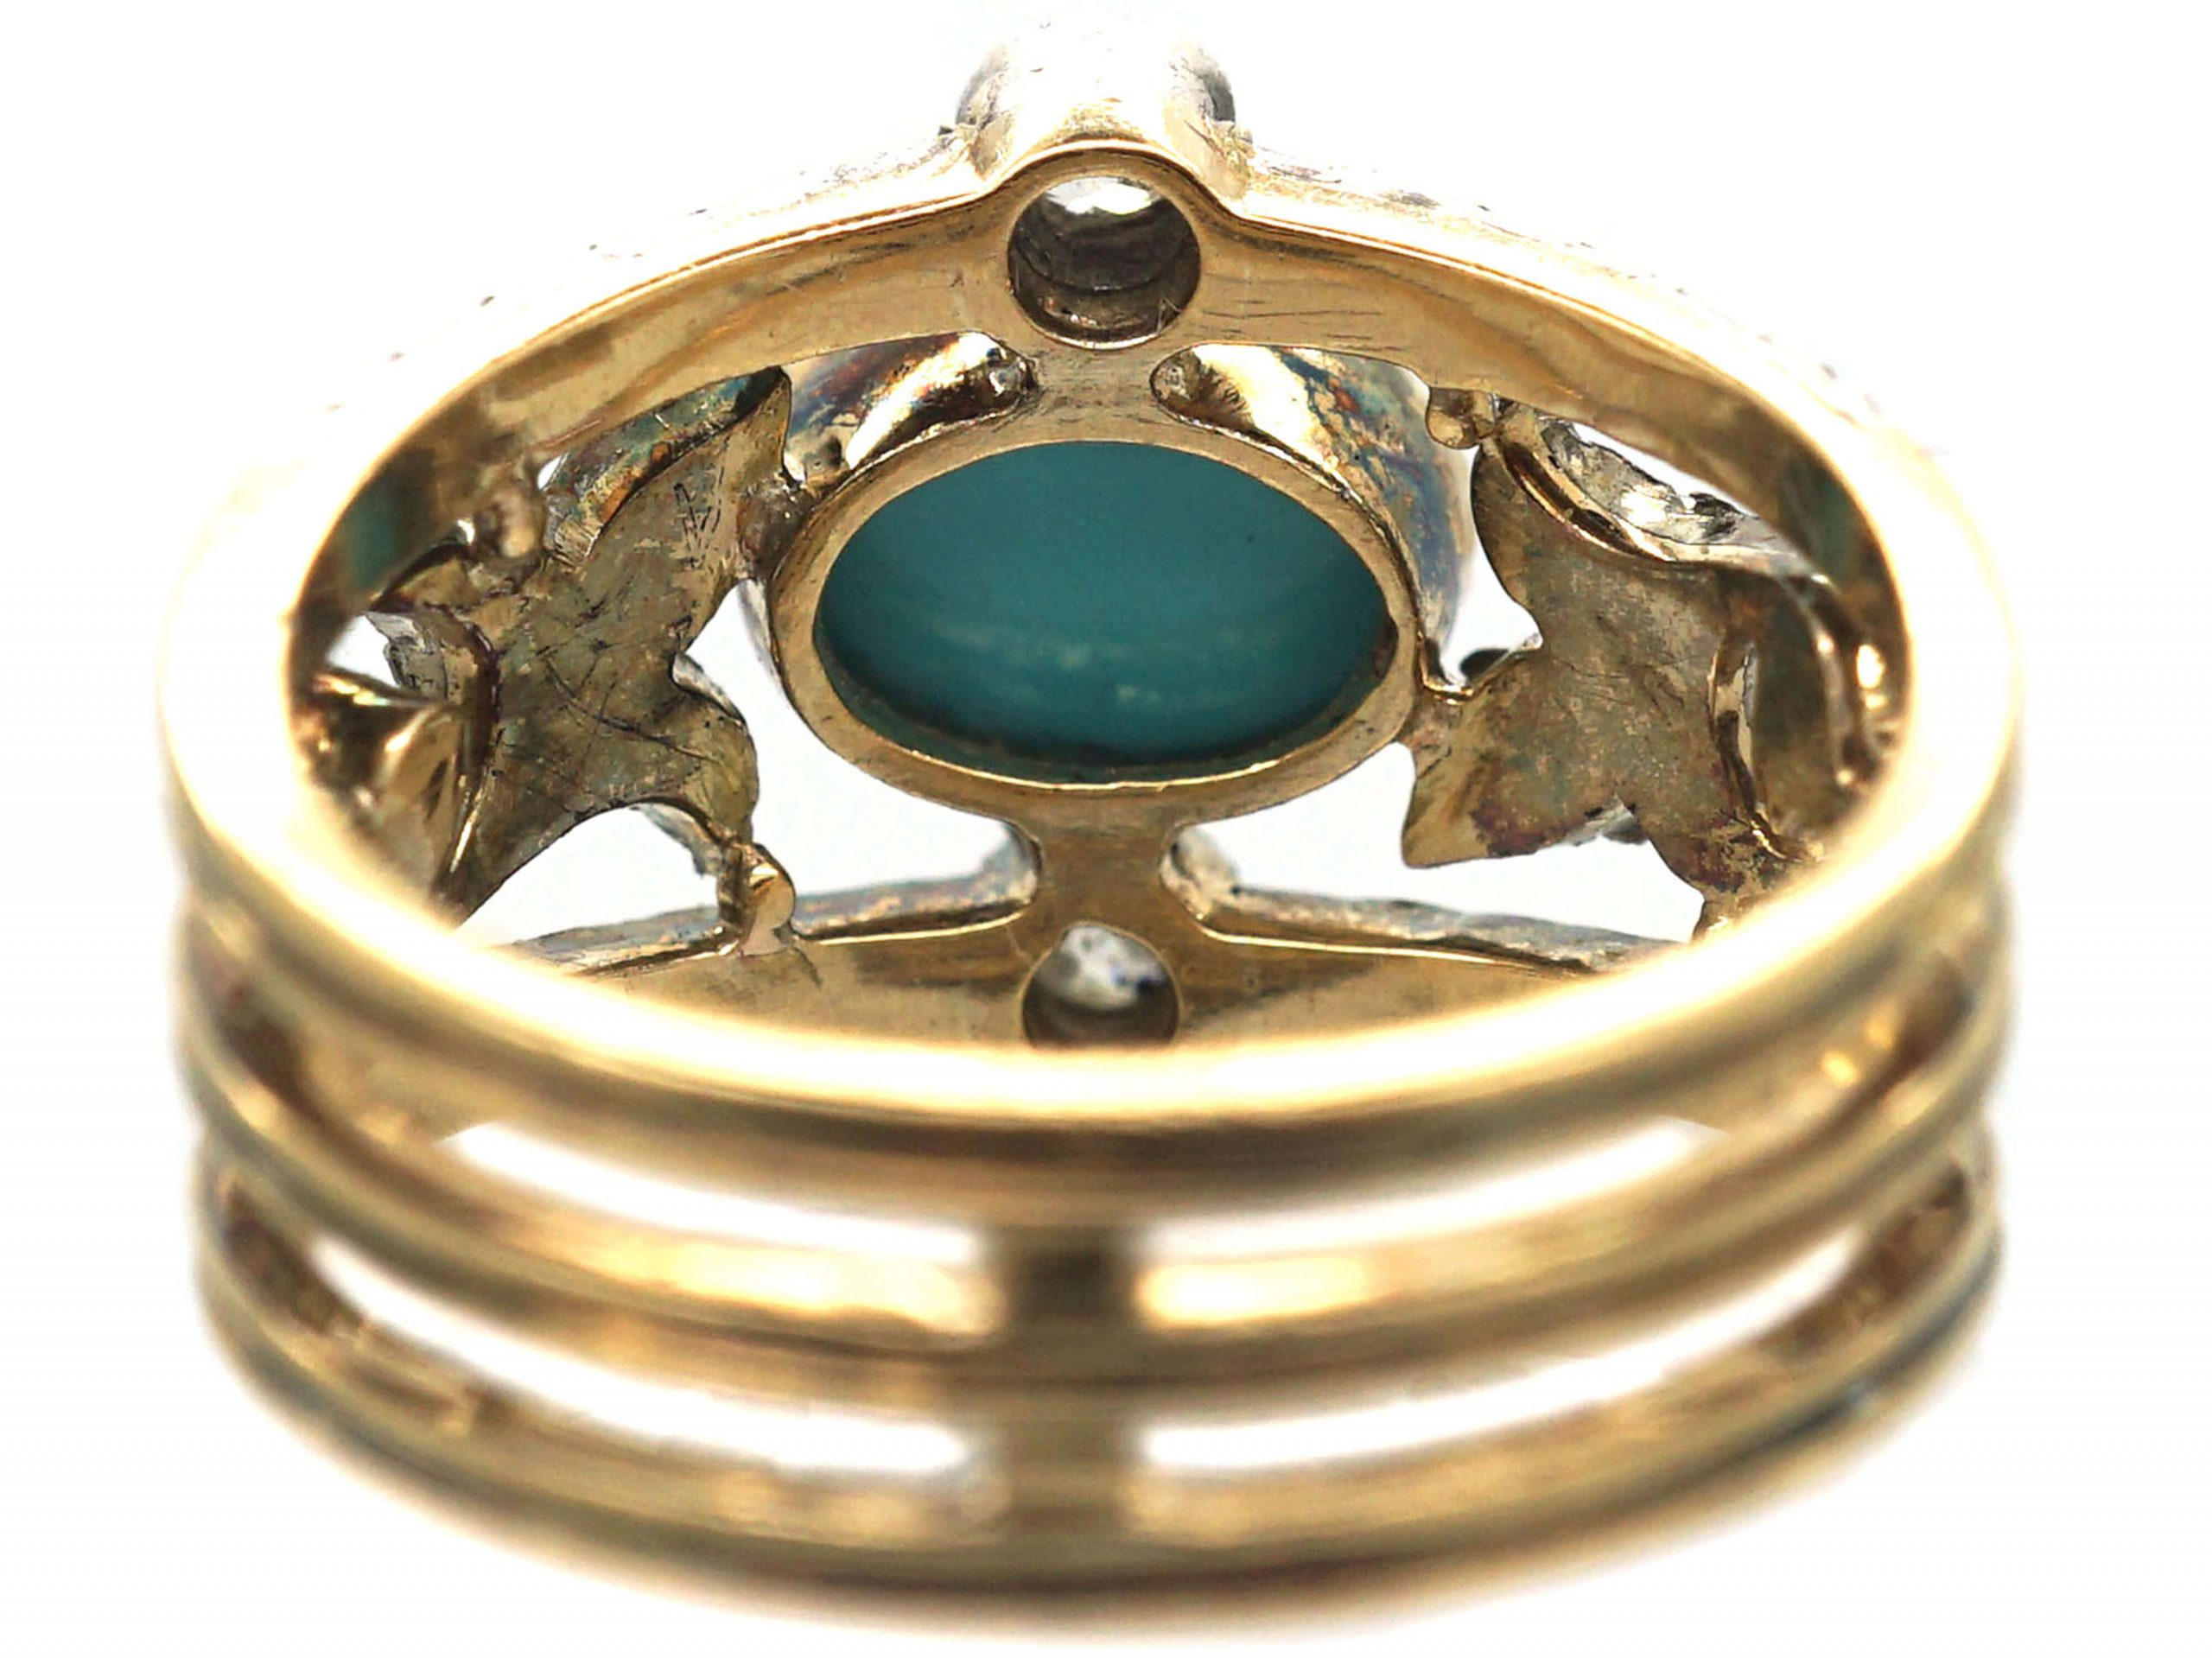 Edwardian 18ct Gold Turquoise & Diamond Ring with Rose Diamond Leaf Detail